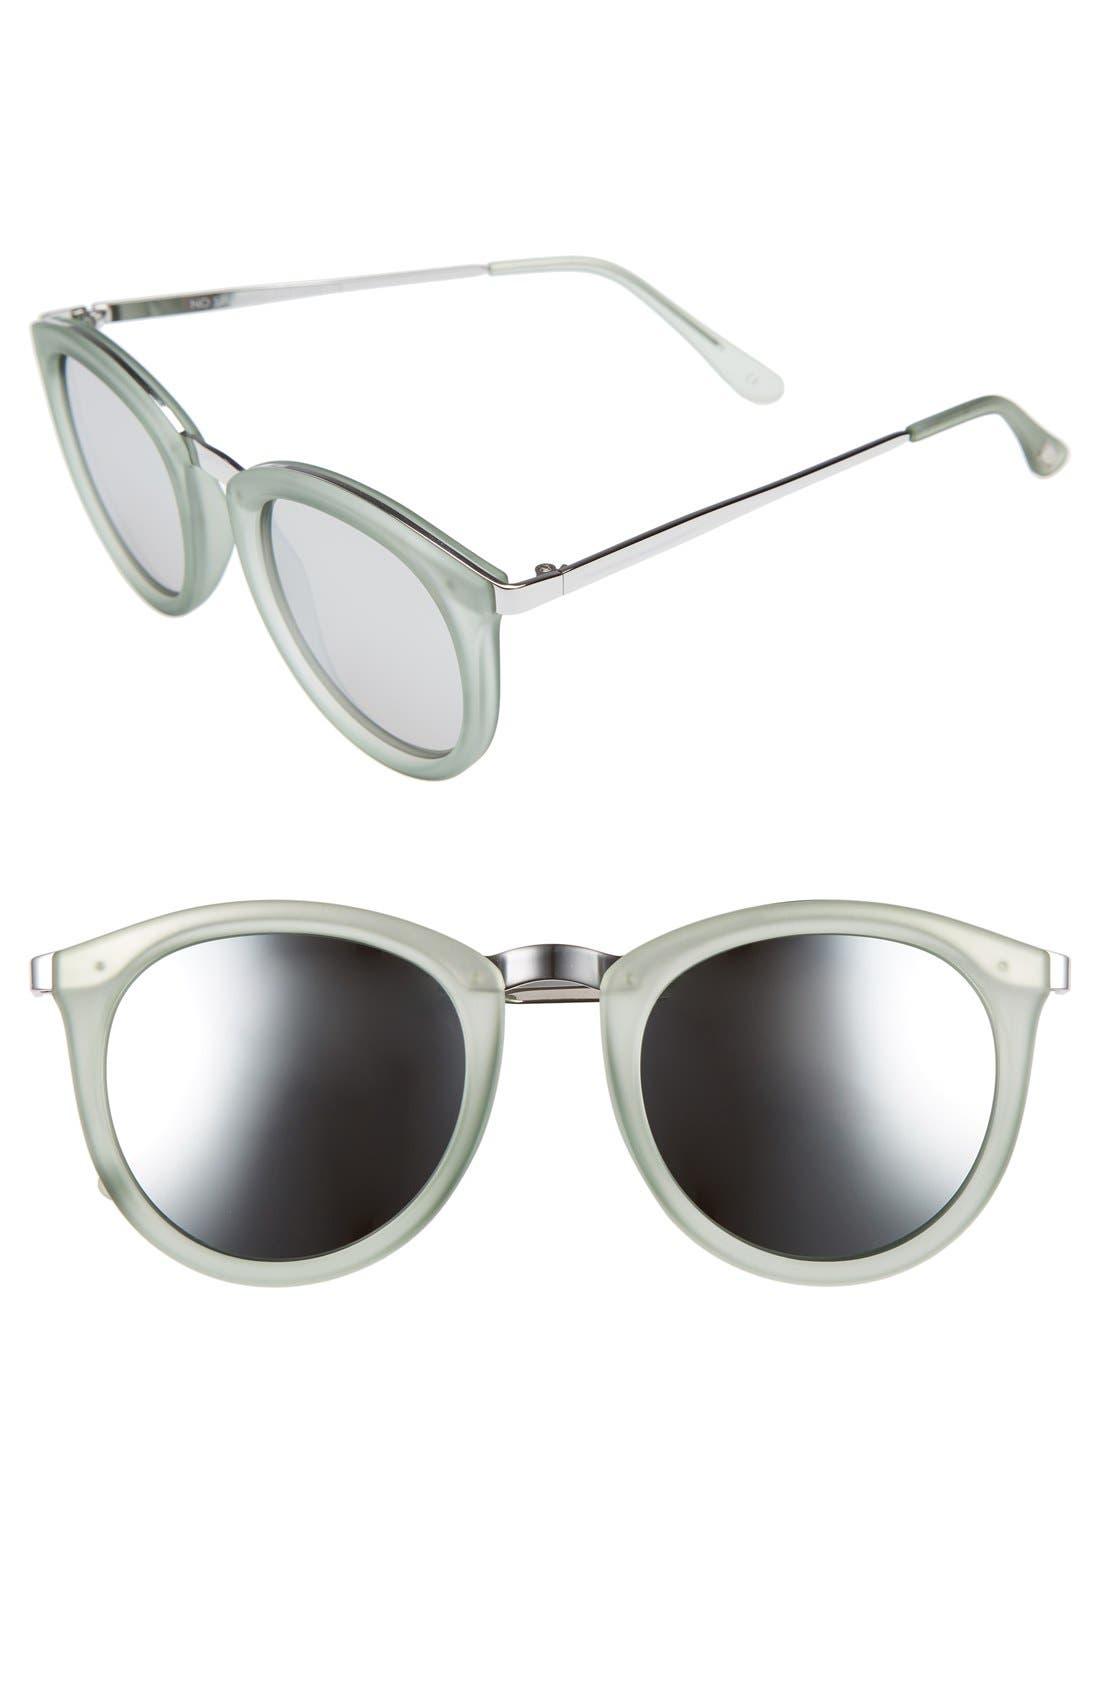 Main Image - Le Specs No Smirking 50mm Sunglasses